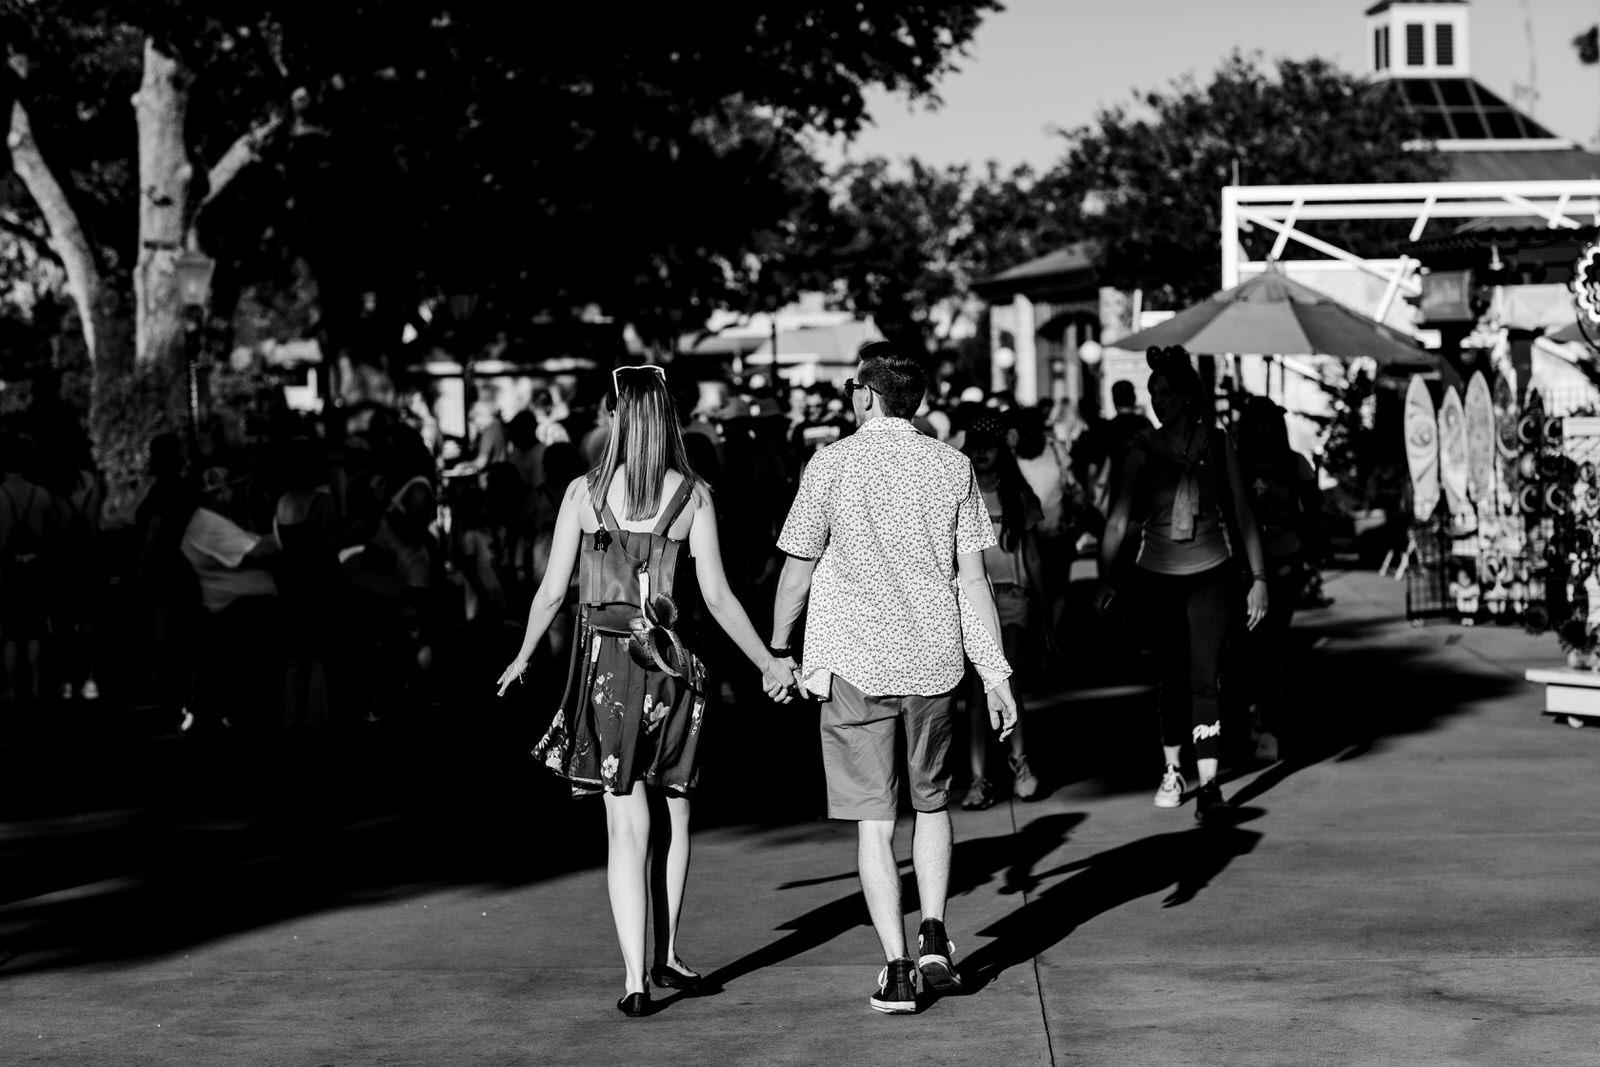 Adorable-Engagement-Session-Epcot-Orlando-Tiny-House-Photo-Wedding-Photographer-22.jpg